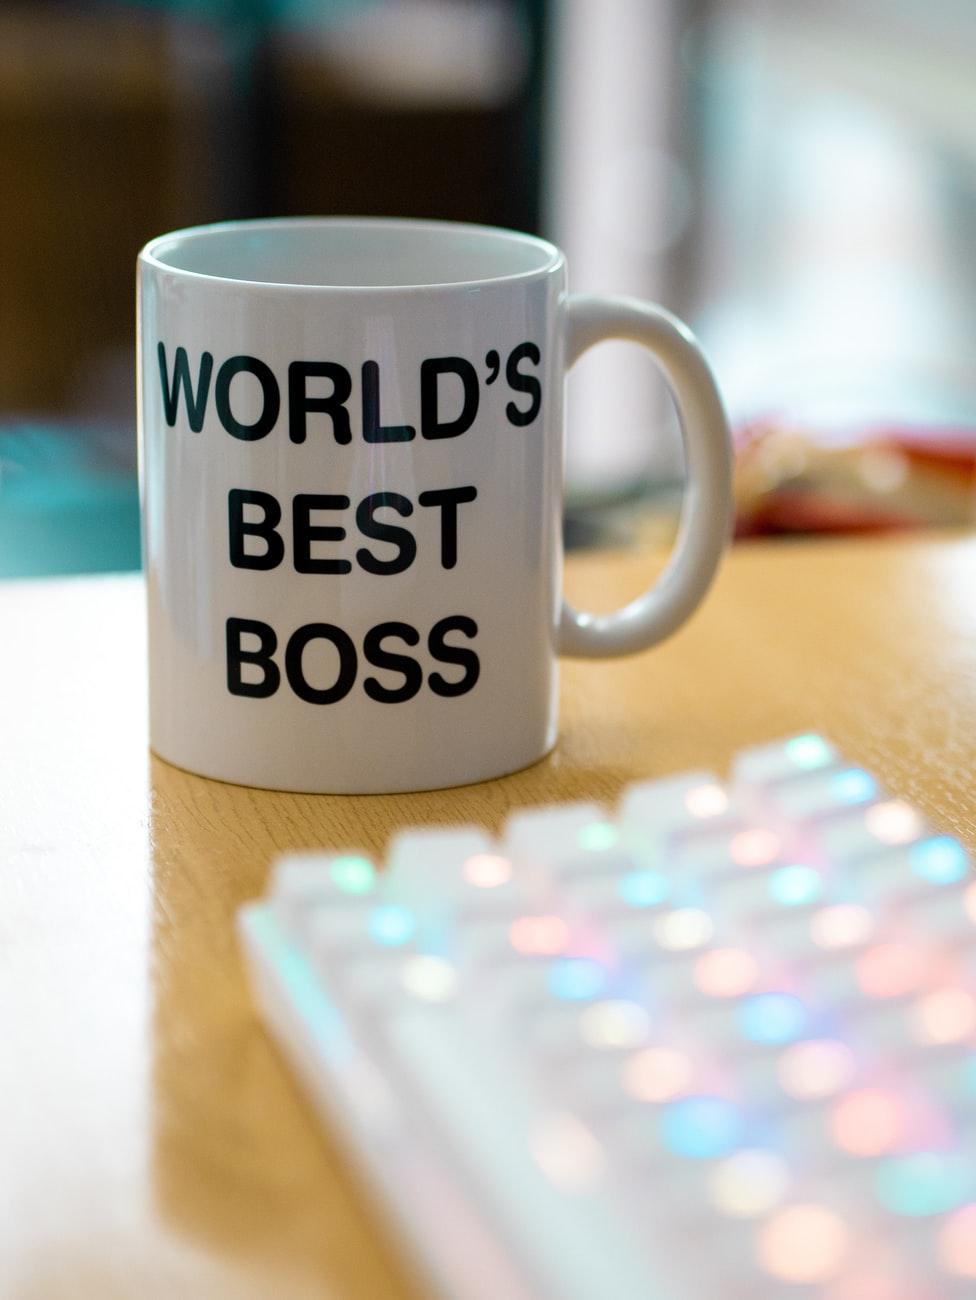 Boss cup